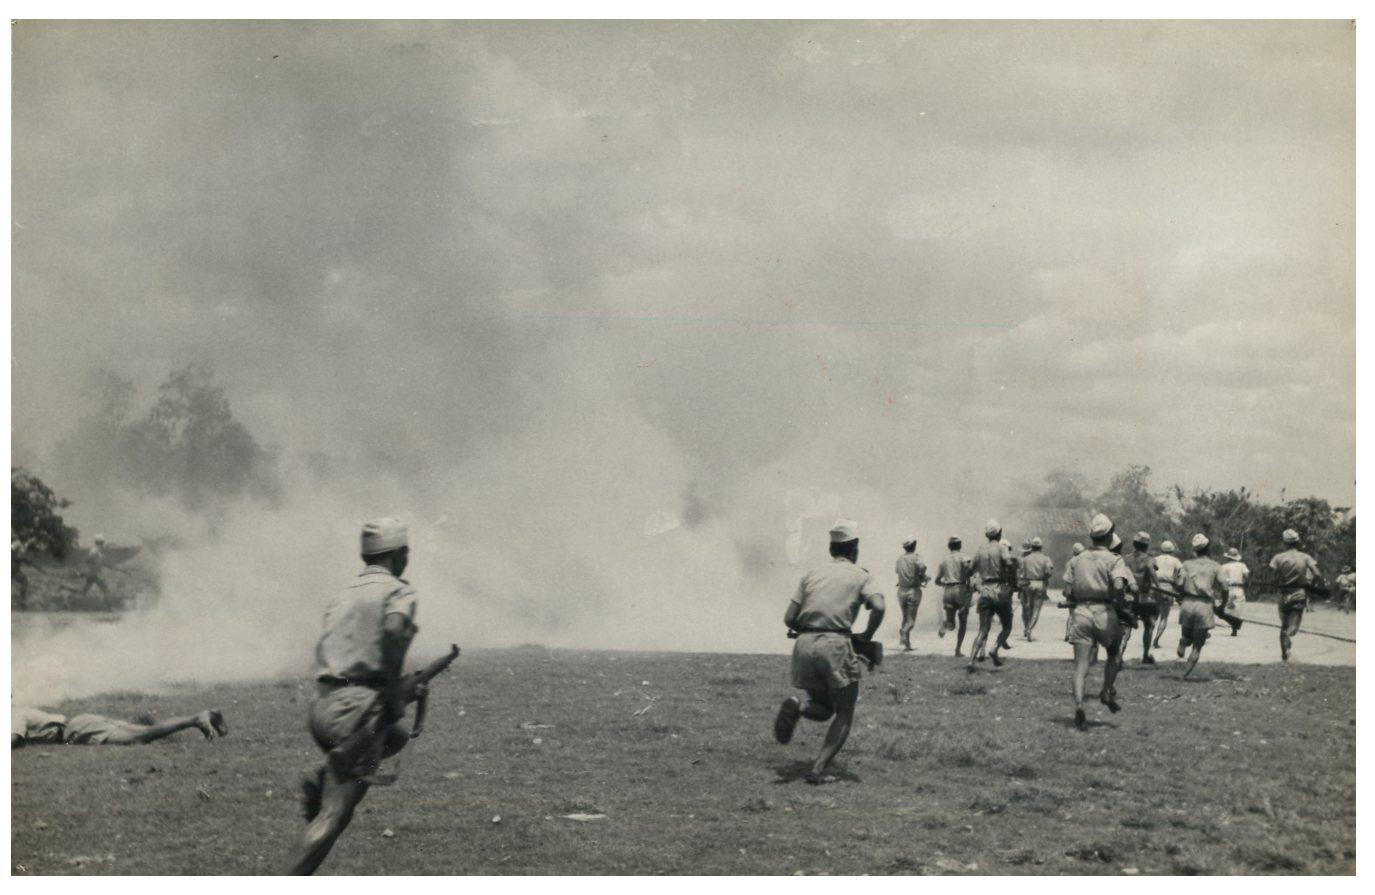 Indochine, Guerre d'Indochine 1946-1954 Vintage silver